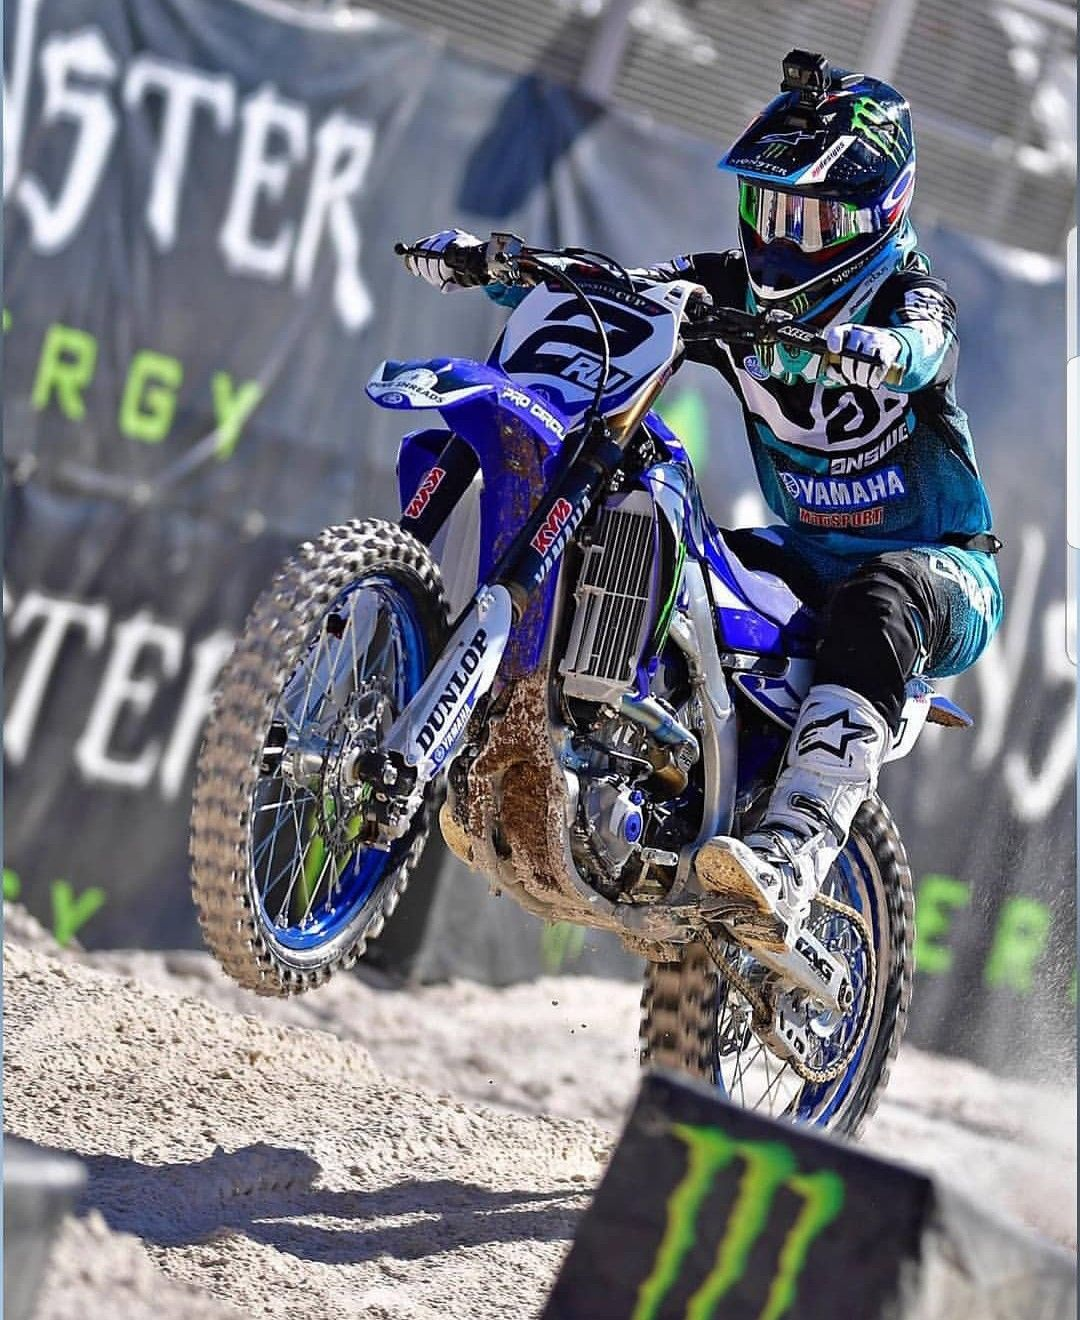 Pin By Tyson Tollstrup On World Of Racing Yamaha Dirt Bikes